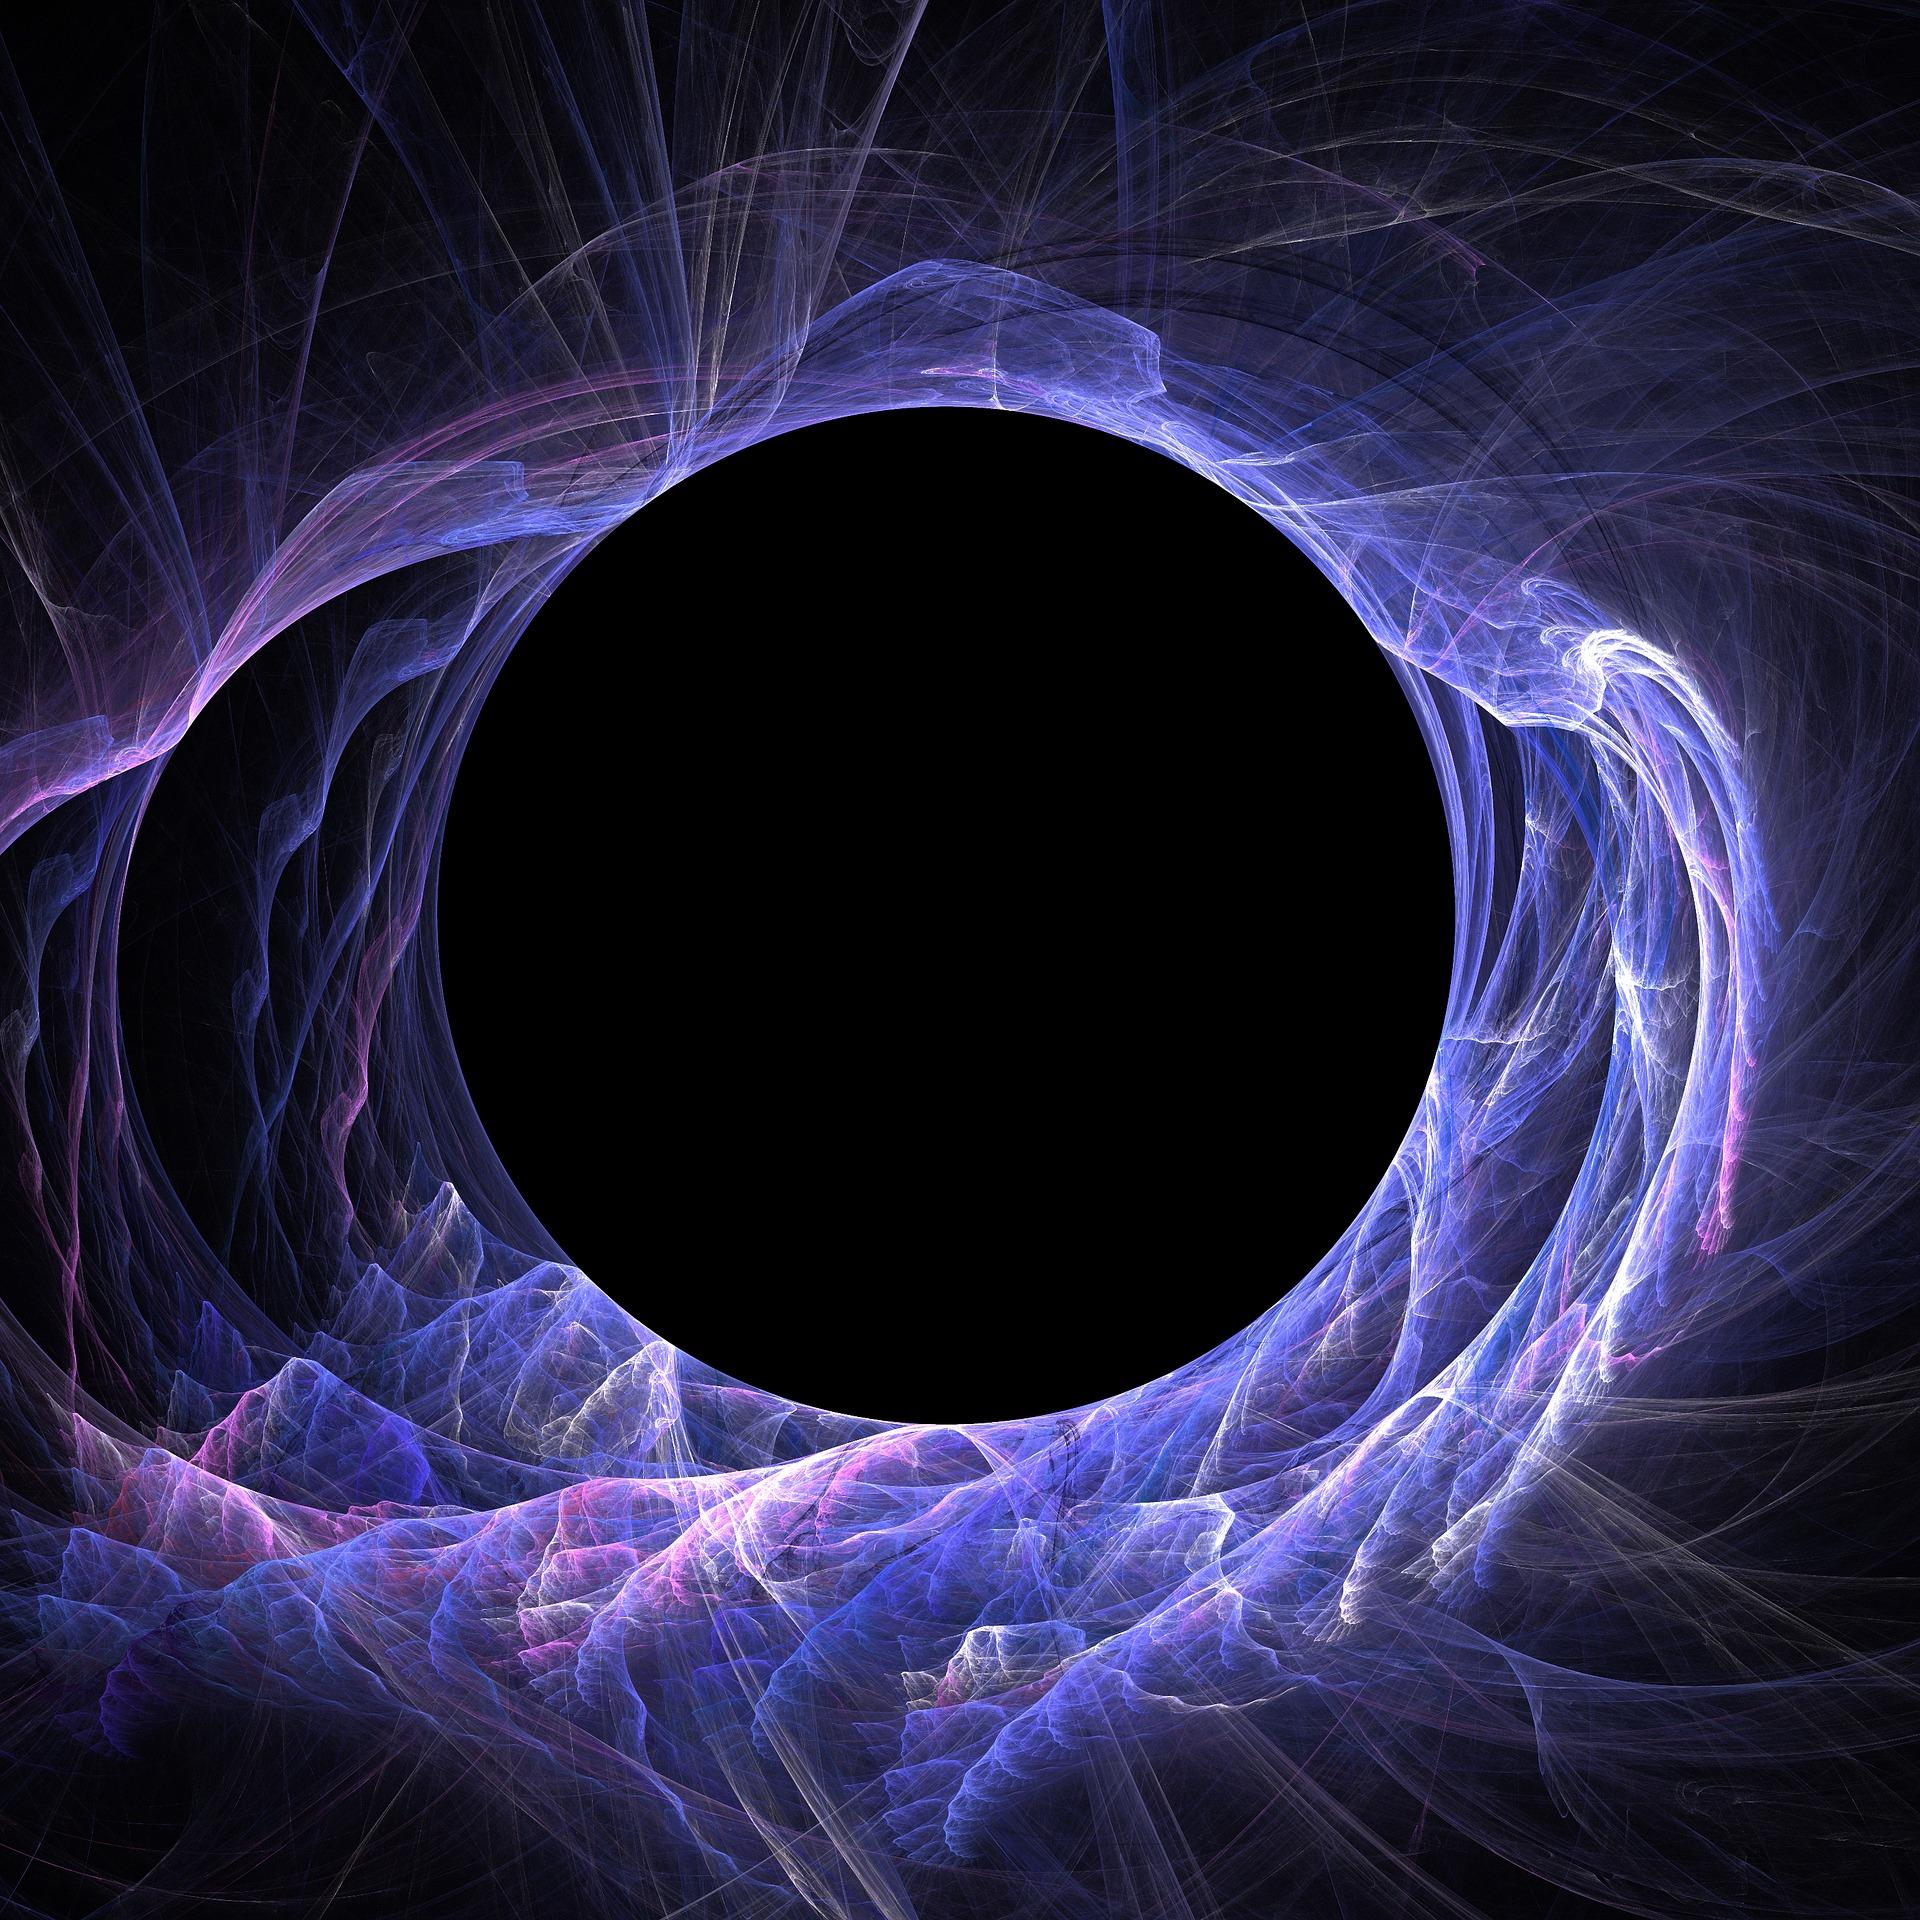 Cerchio - Immagine da Pixabay